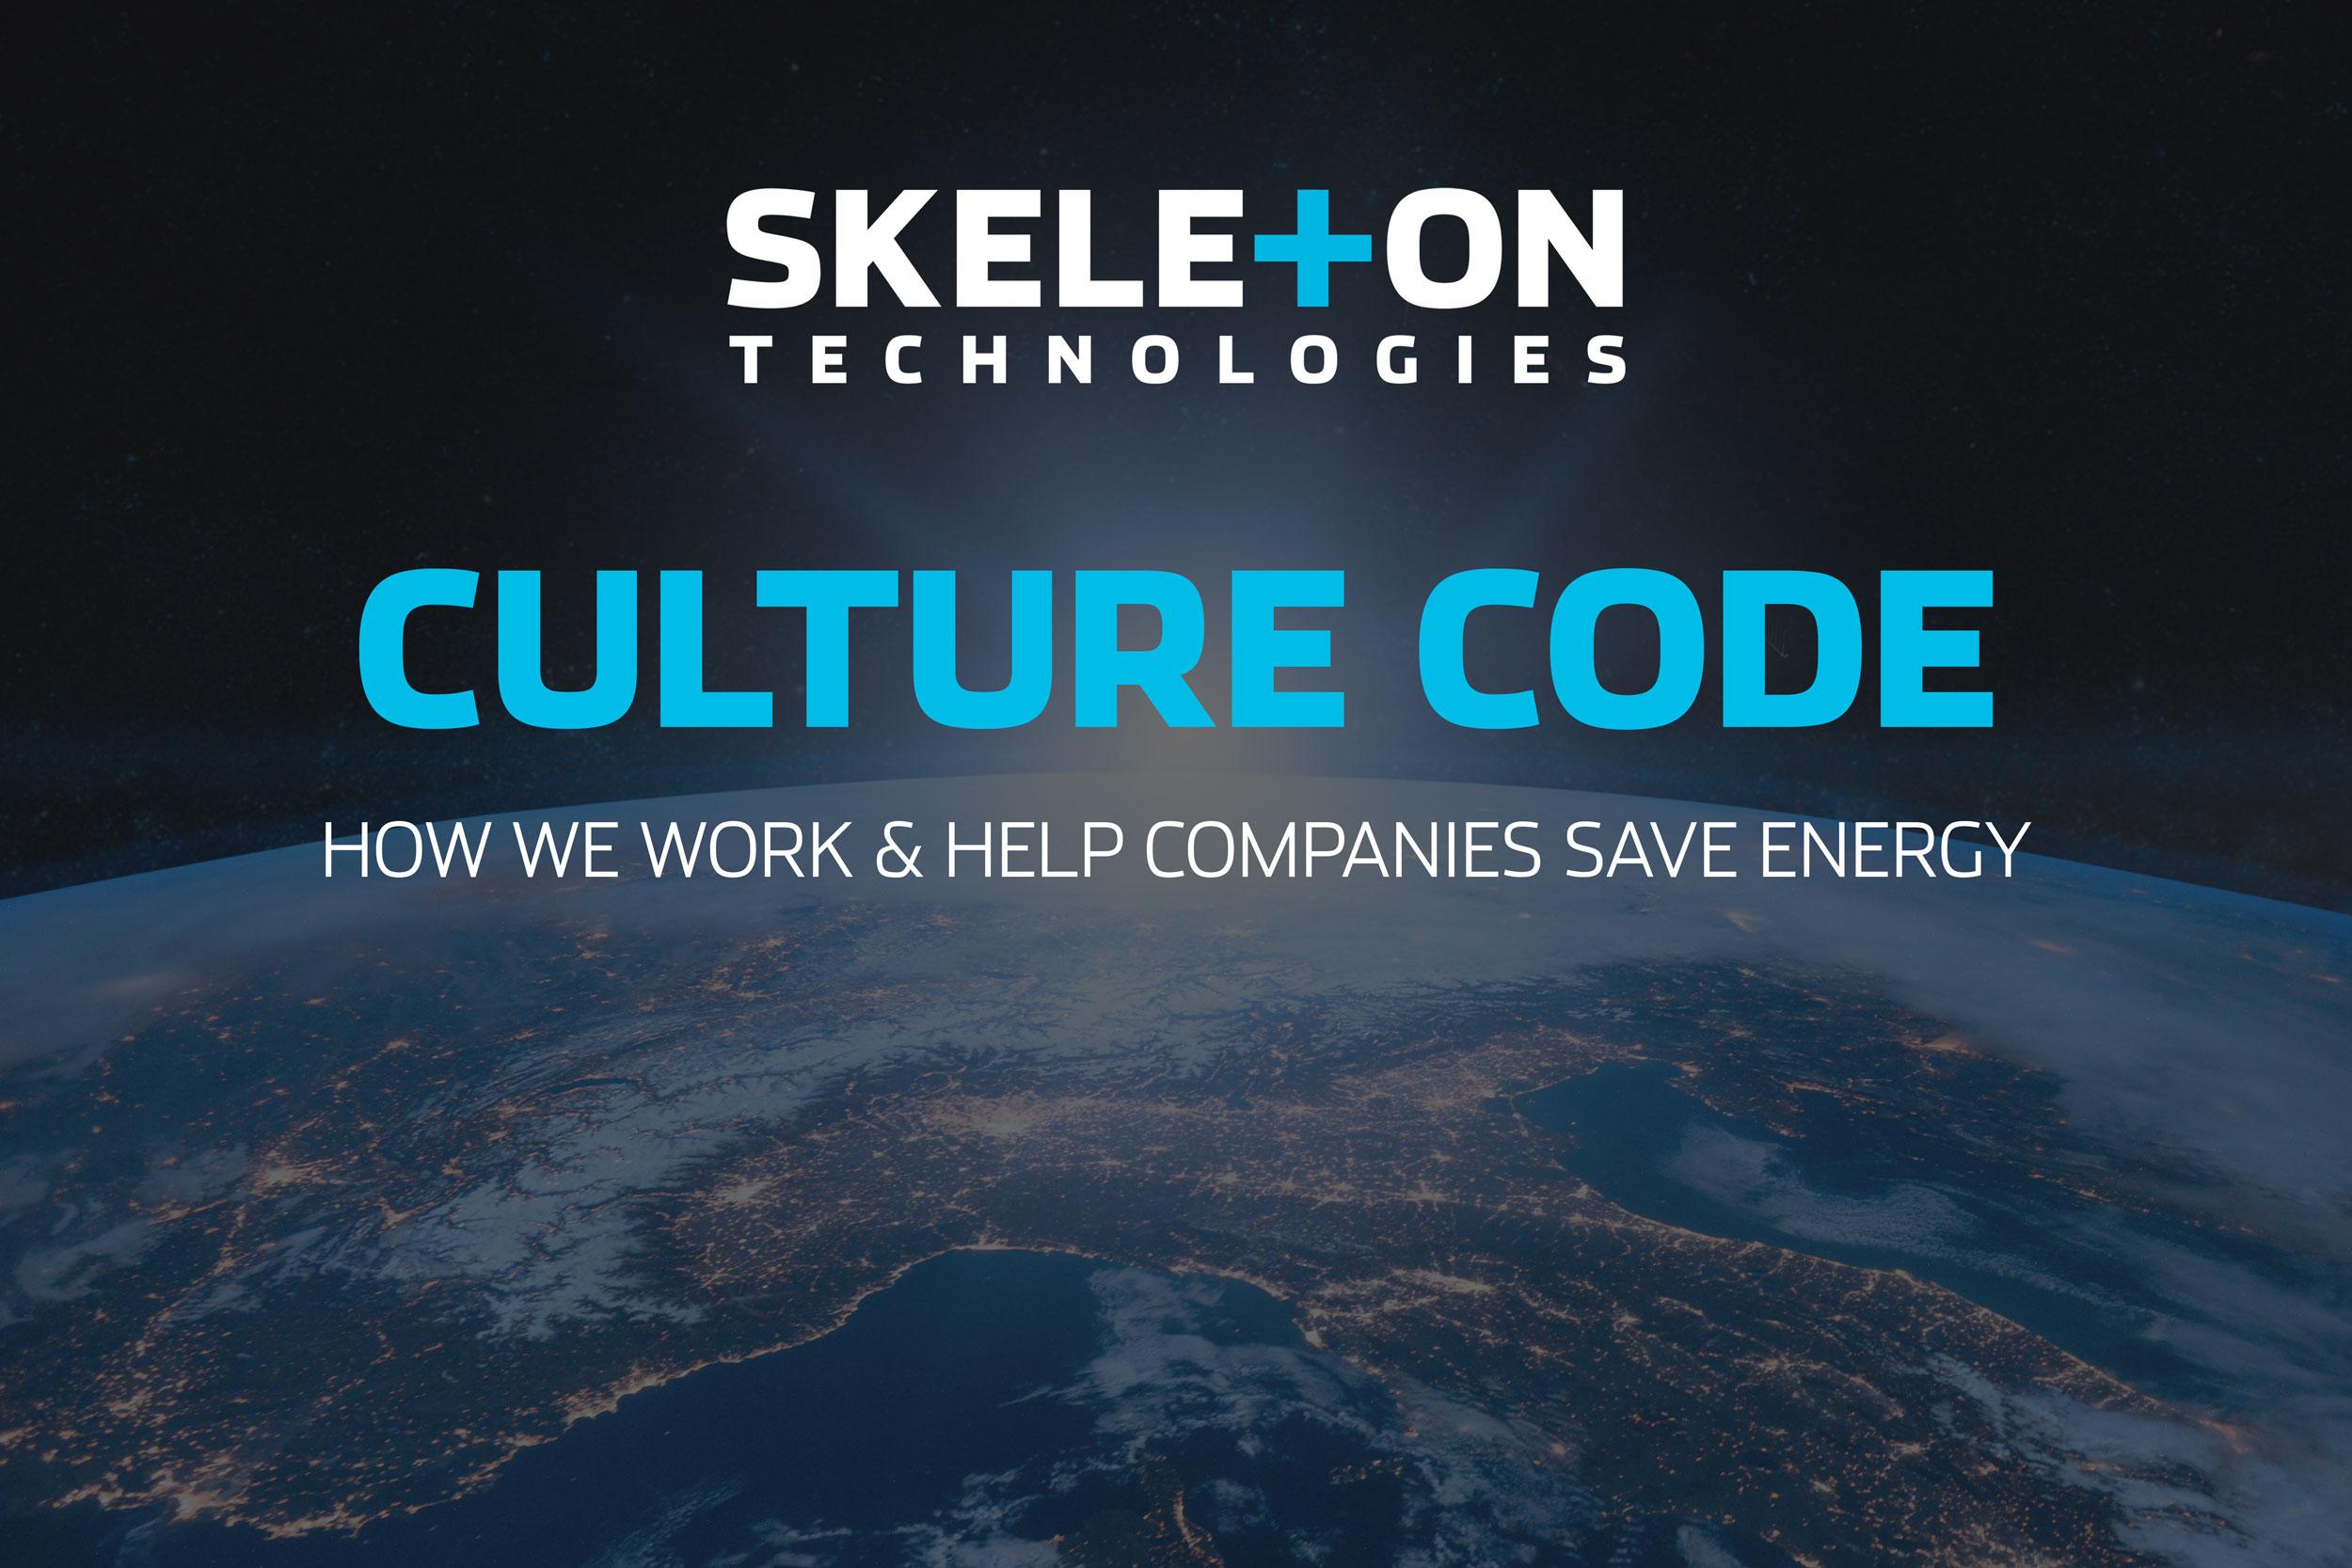 Skeleton-culture-code-2500x